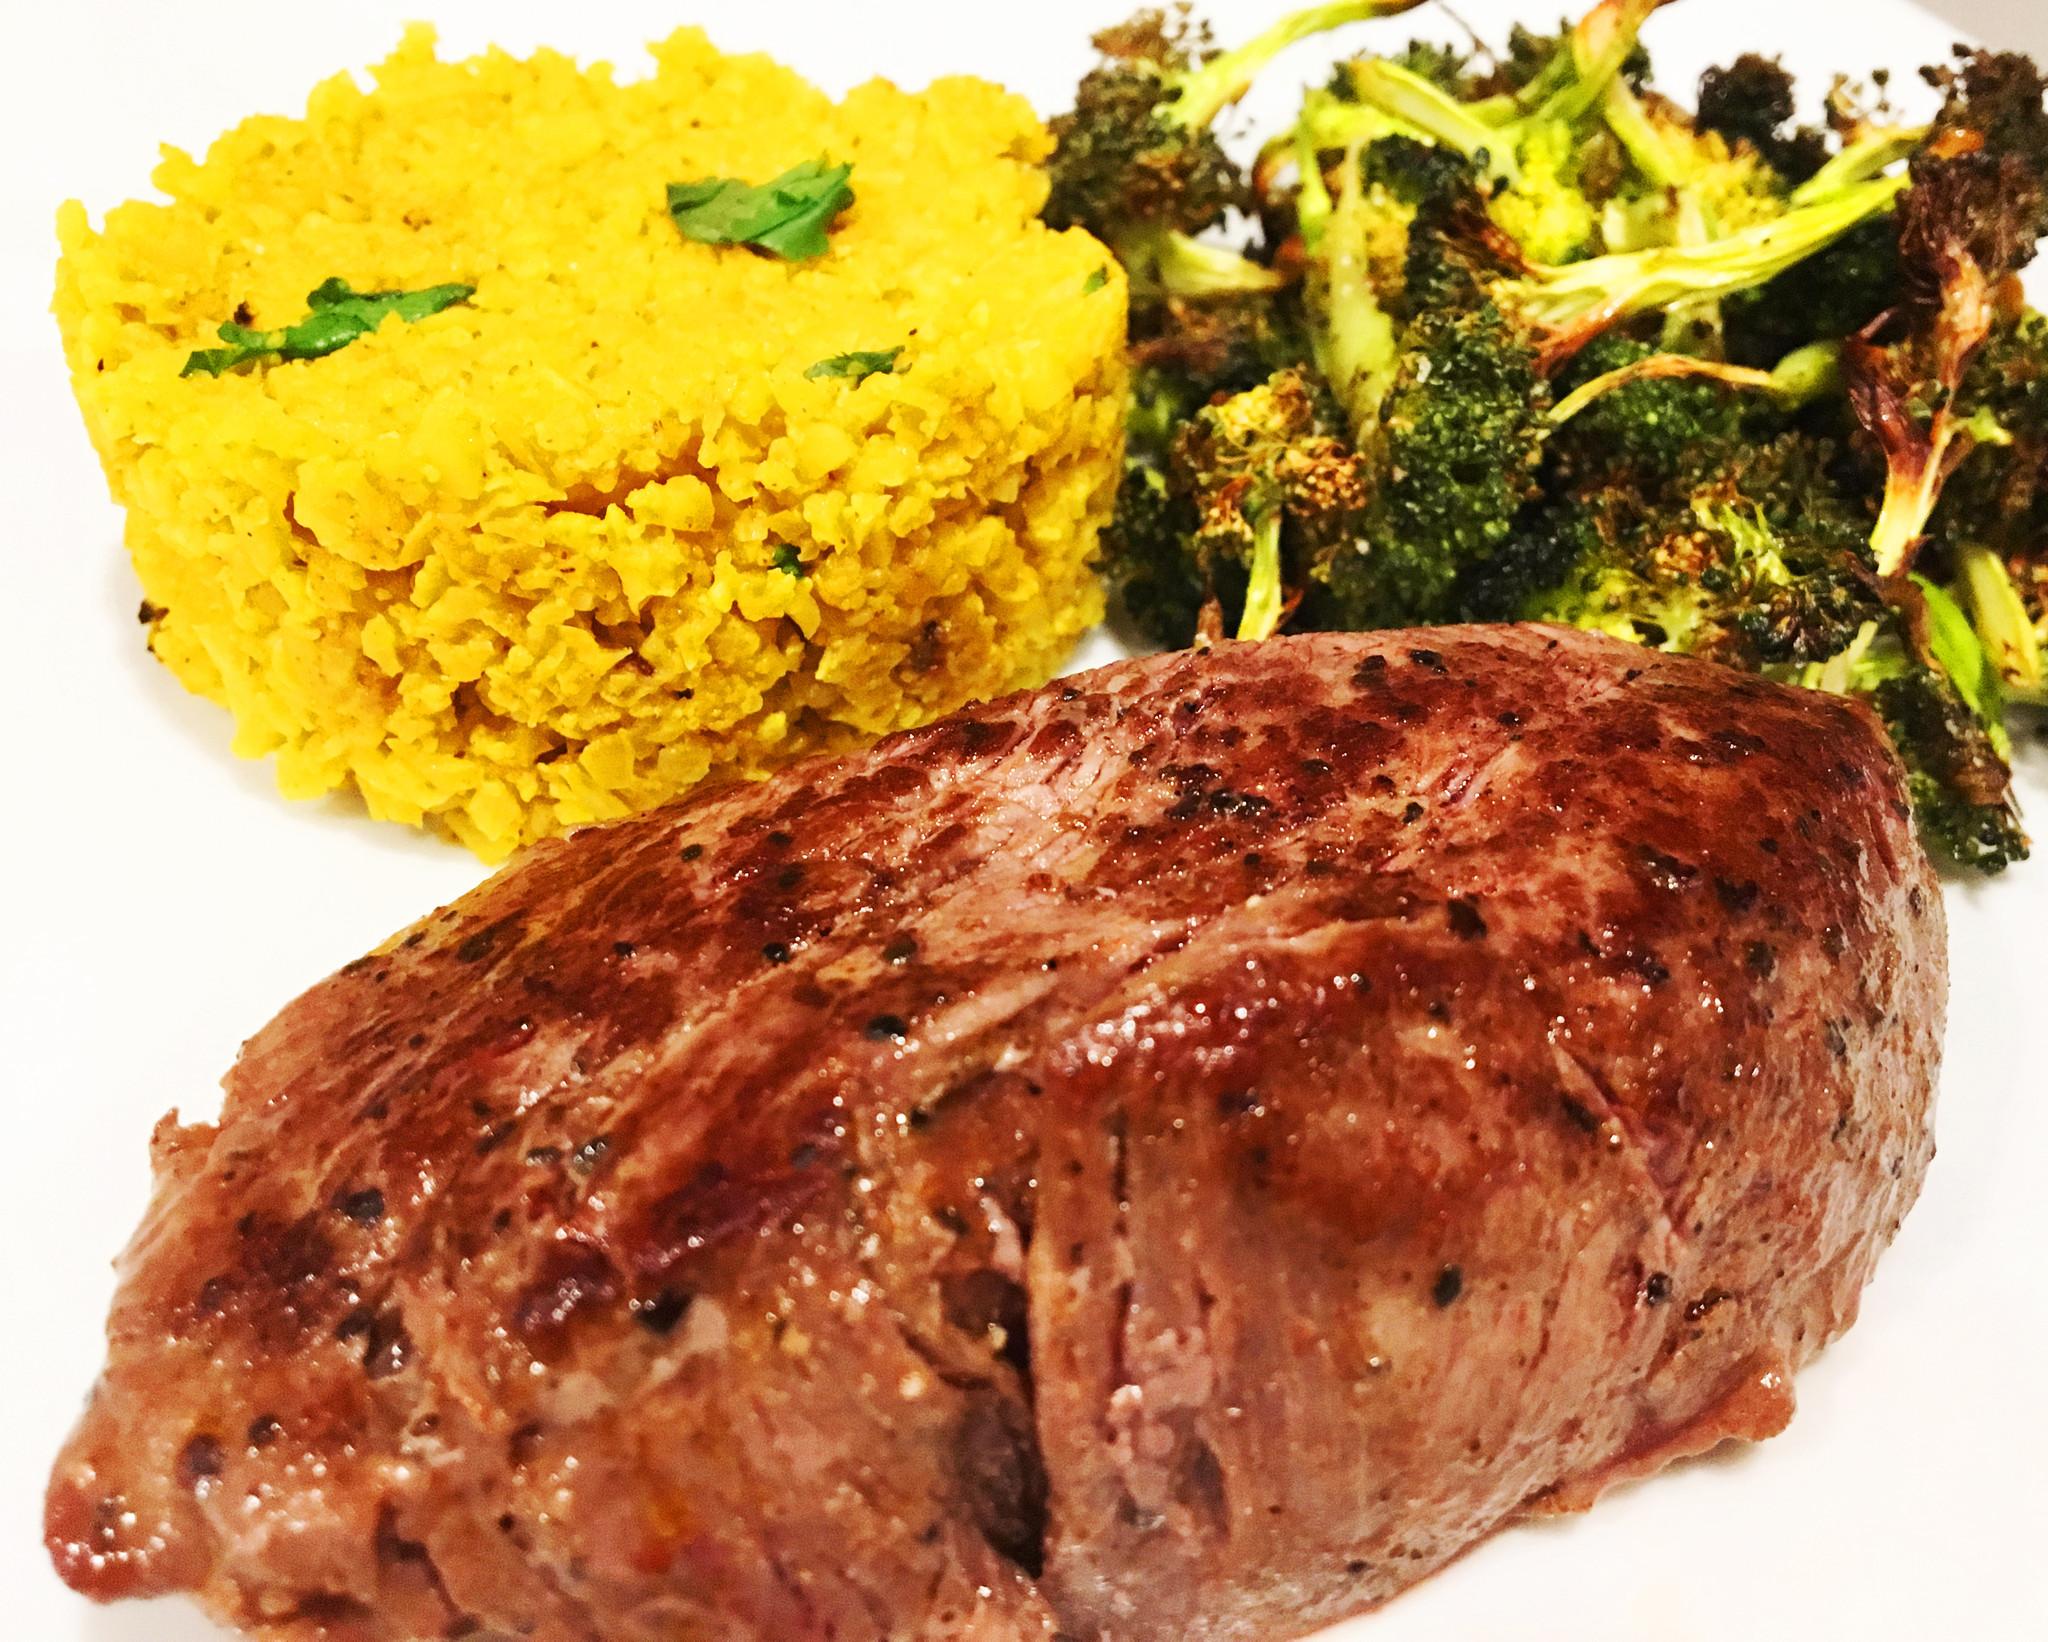 Beef flank steak